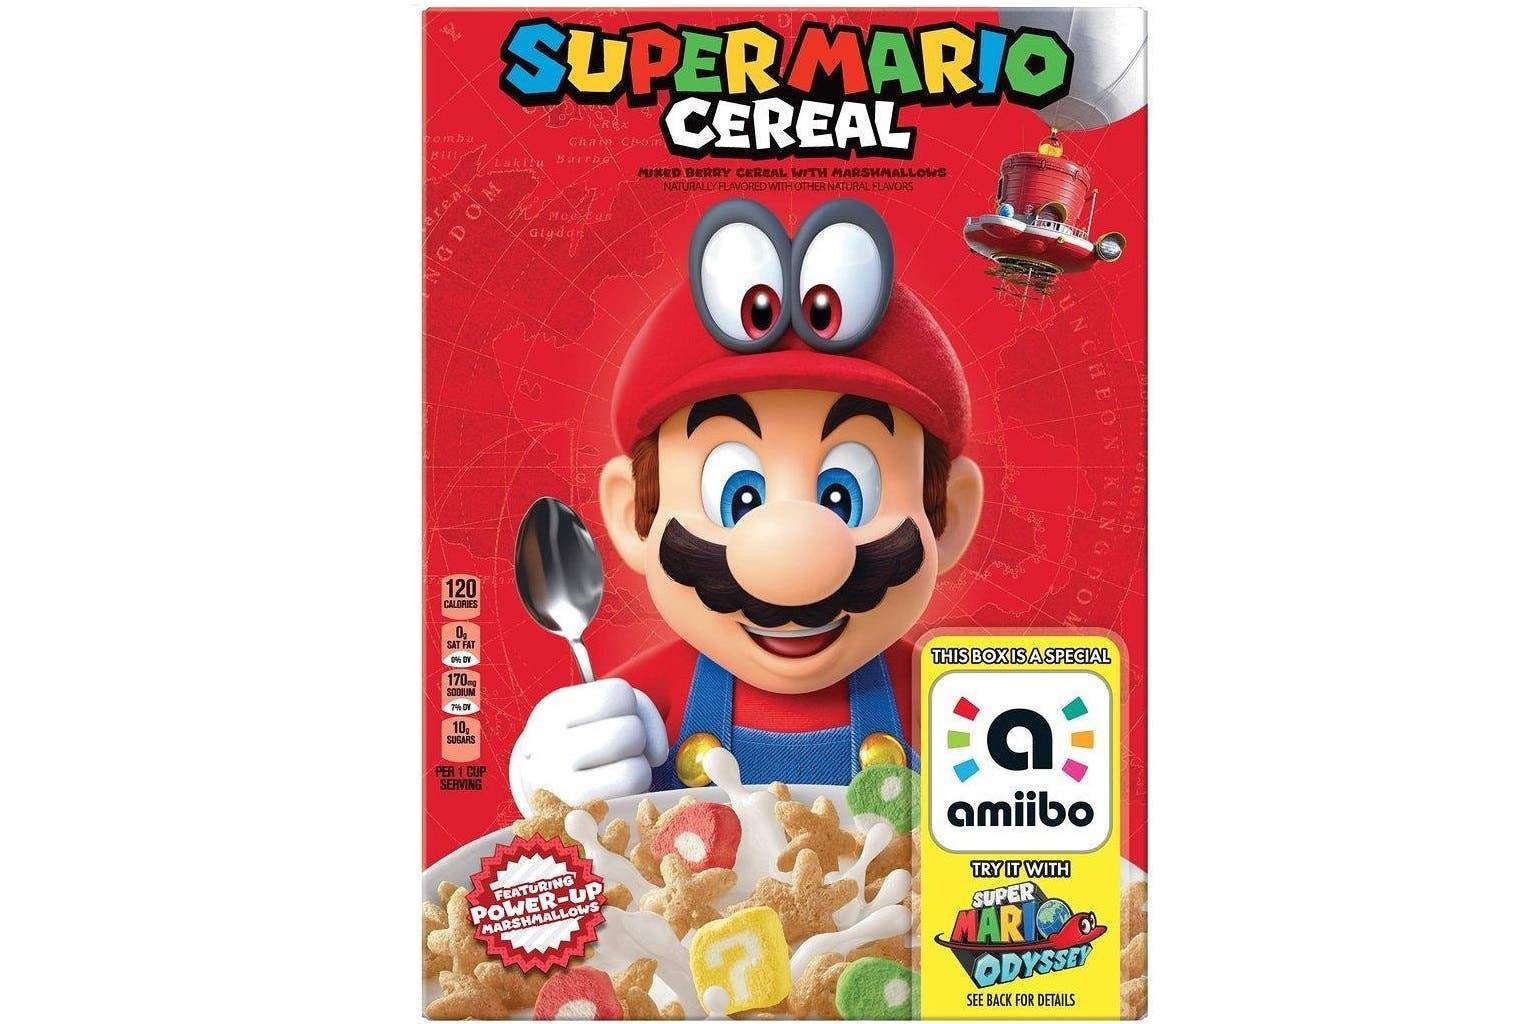 http://www.nintenderos.com/wp-content/uploads/2017/11/super-mario-cereal-kellogs.jpg